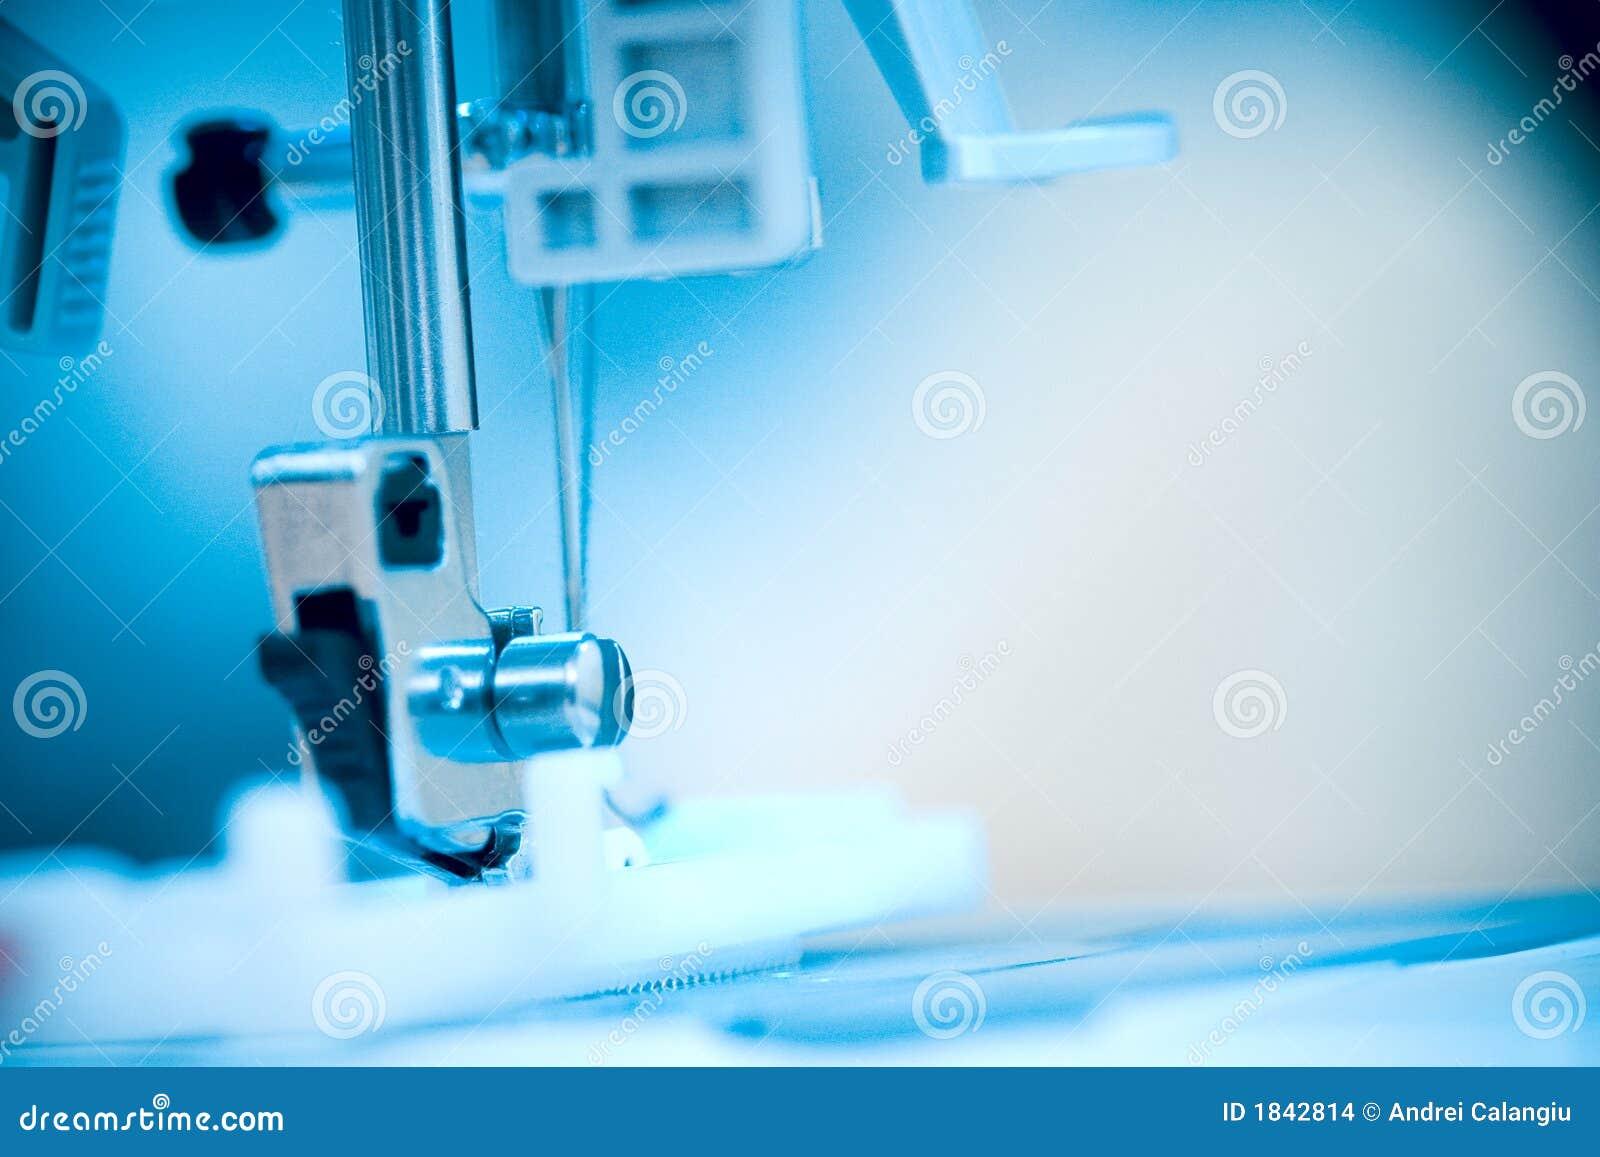 Sewing machine foot.